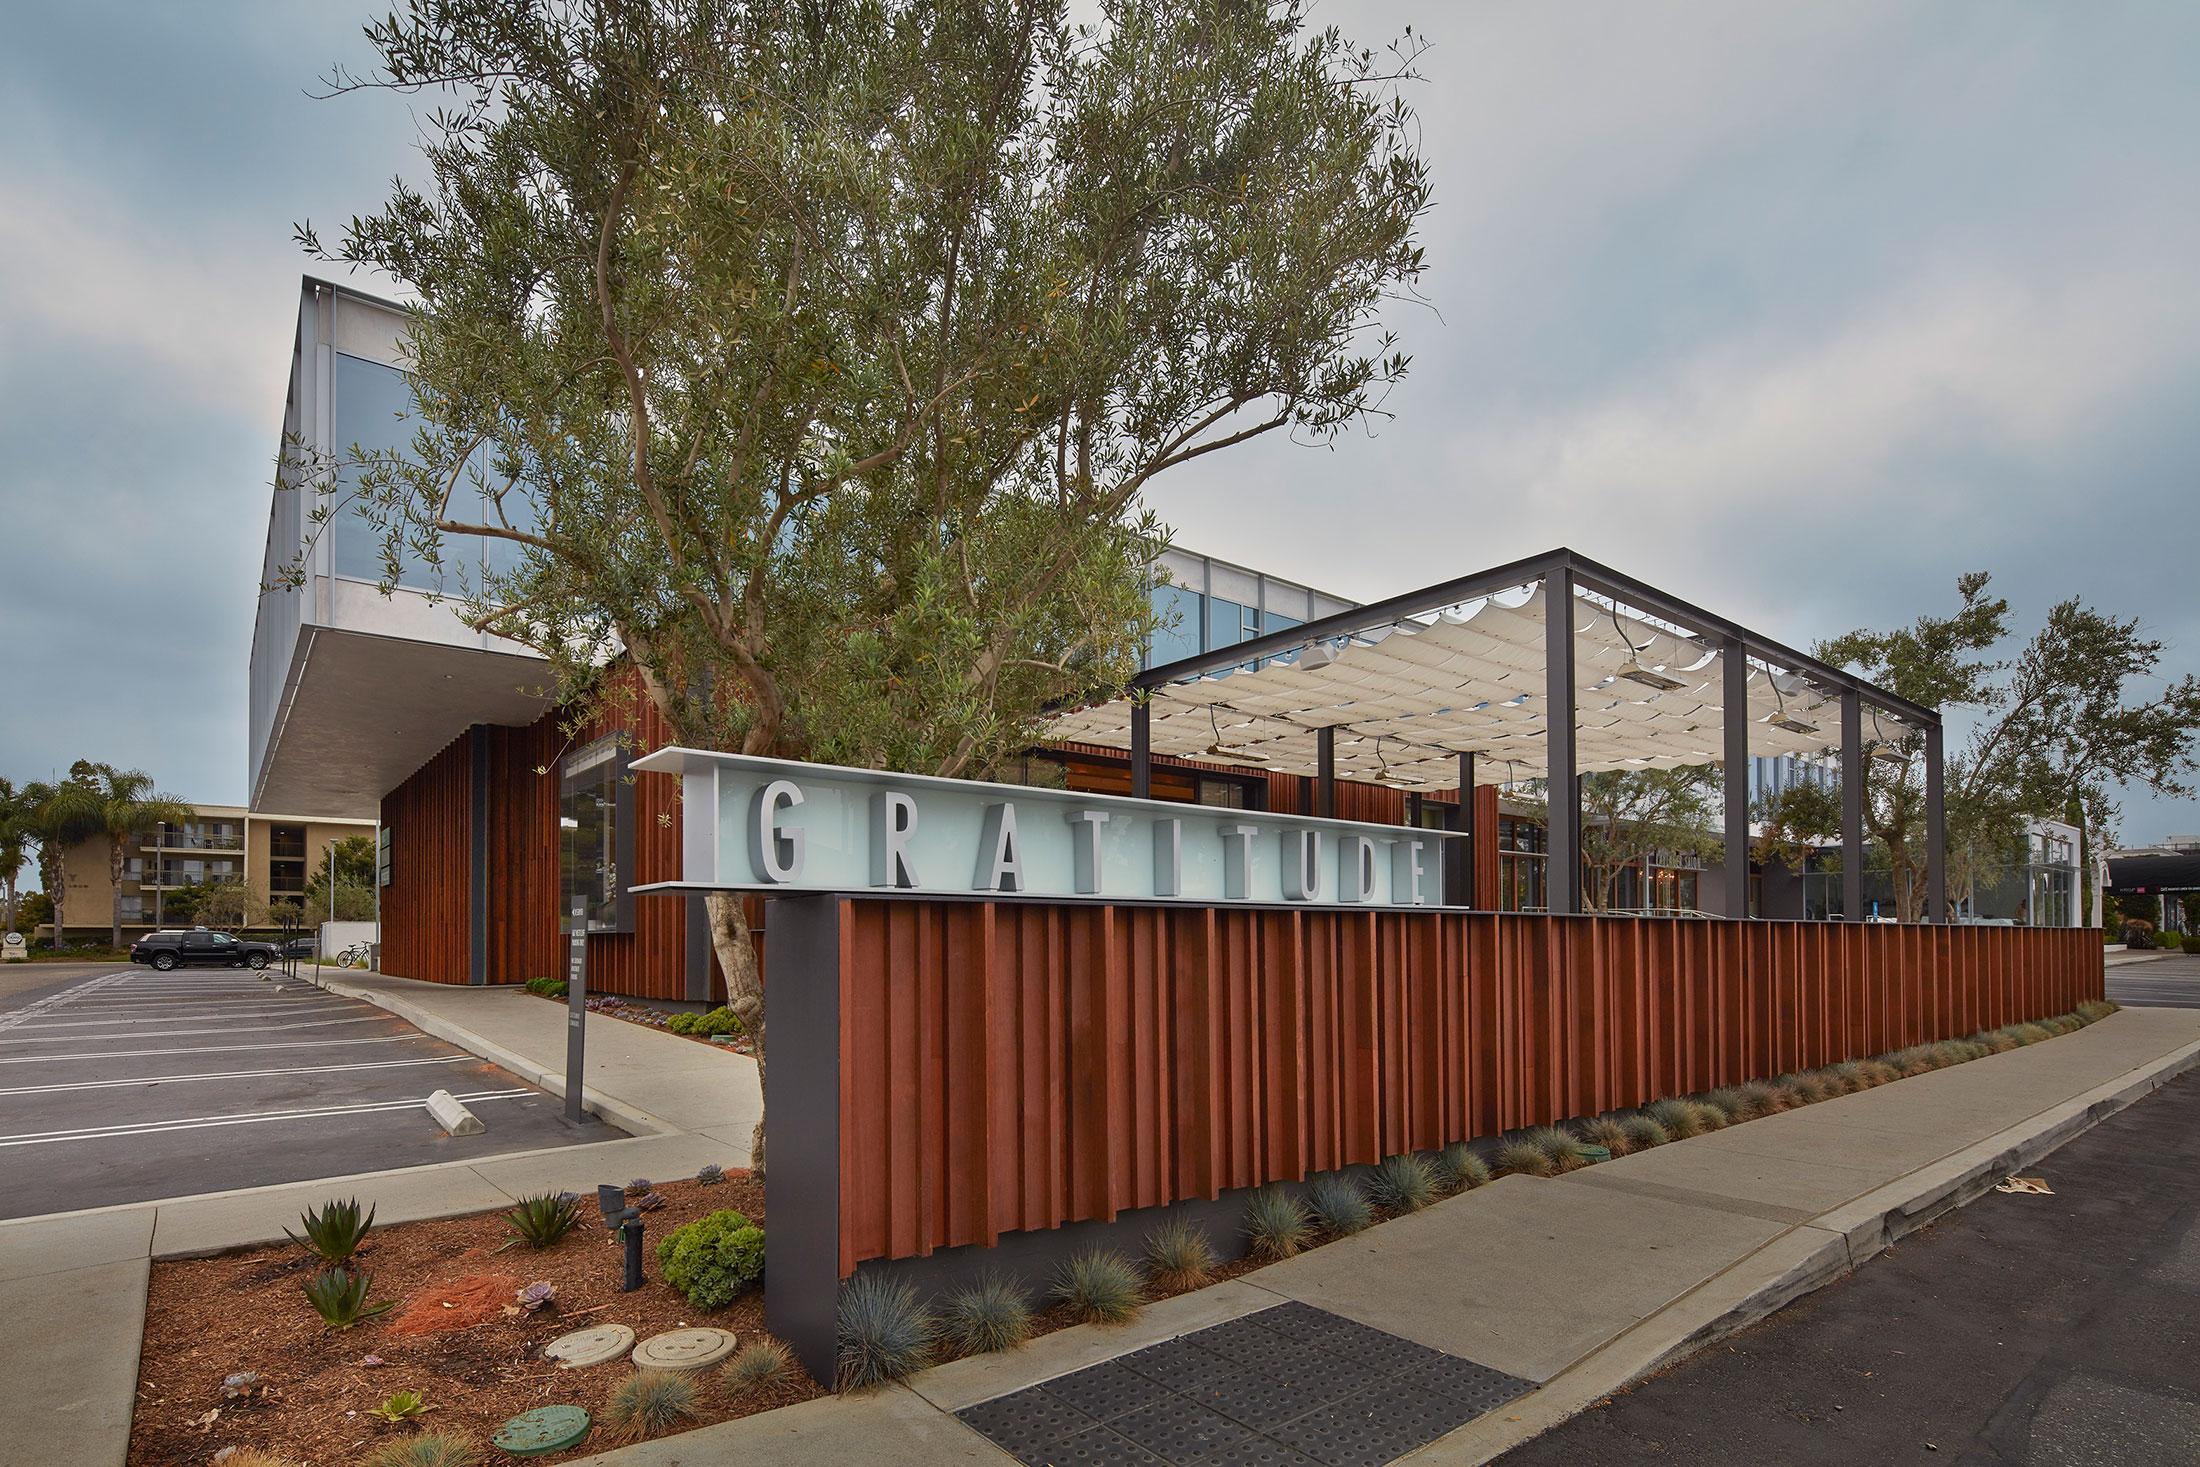 modern-architecture-building-mixed-use-sustainable-shubindonaldson-castaway-commons-6